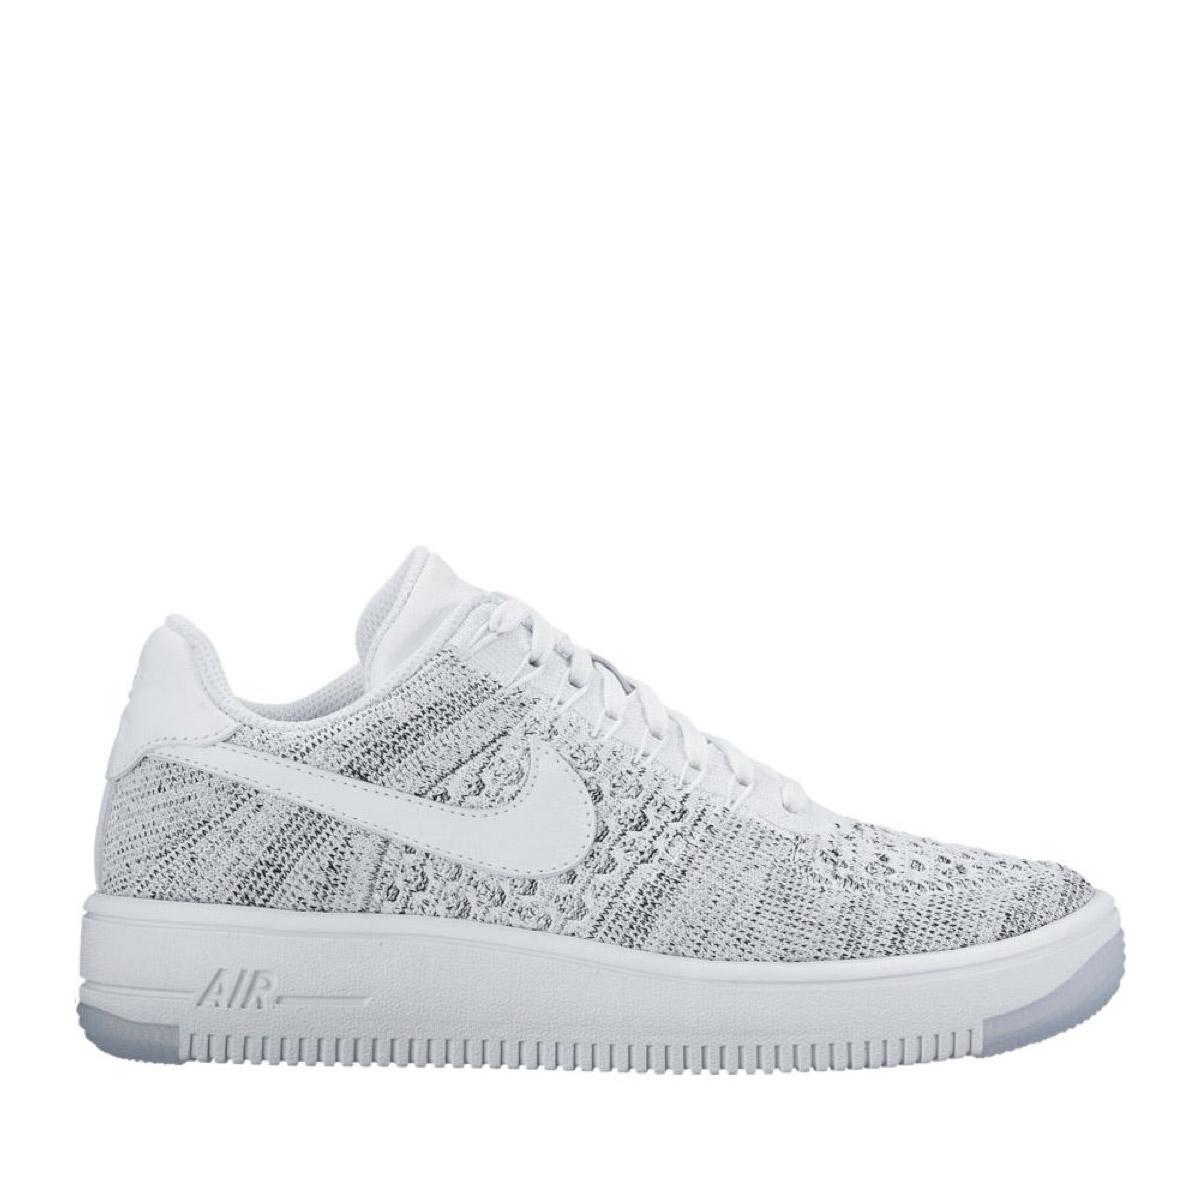 5fc25f81c84c30 Kinetics  NIKE W AF1 FLYKNIT LOW (WHITE WHITE-BLACK) (Nike women AF1 fly  knit low)